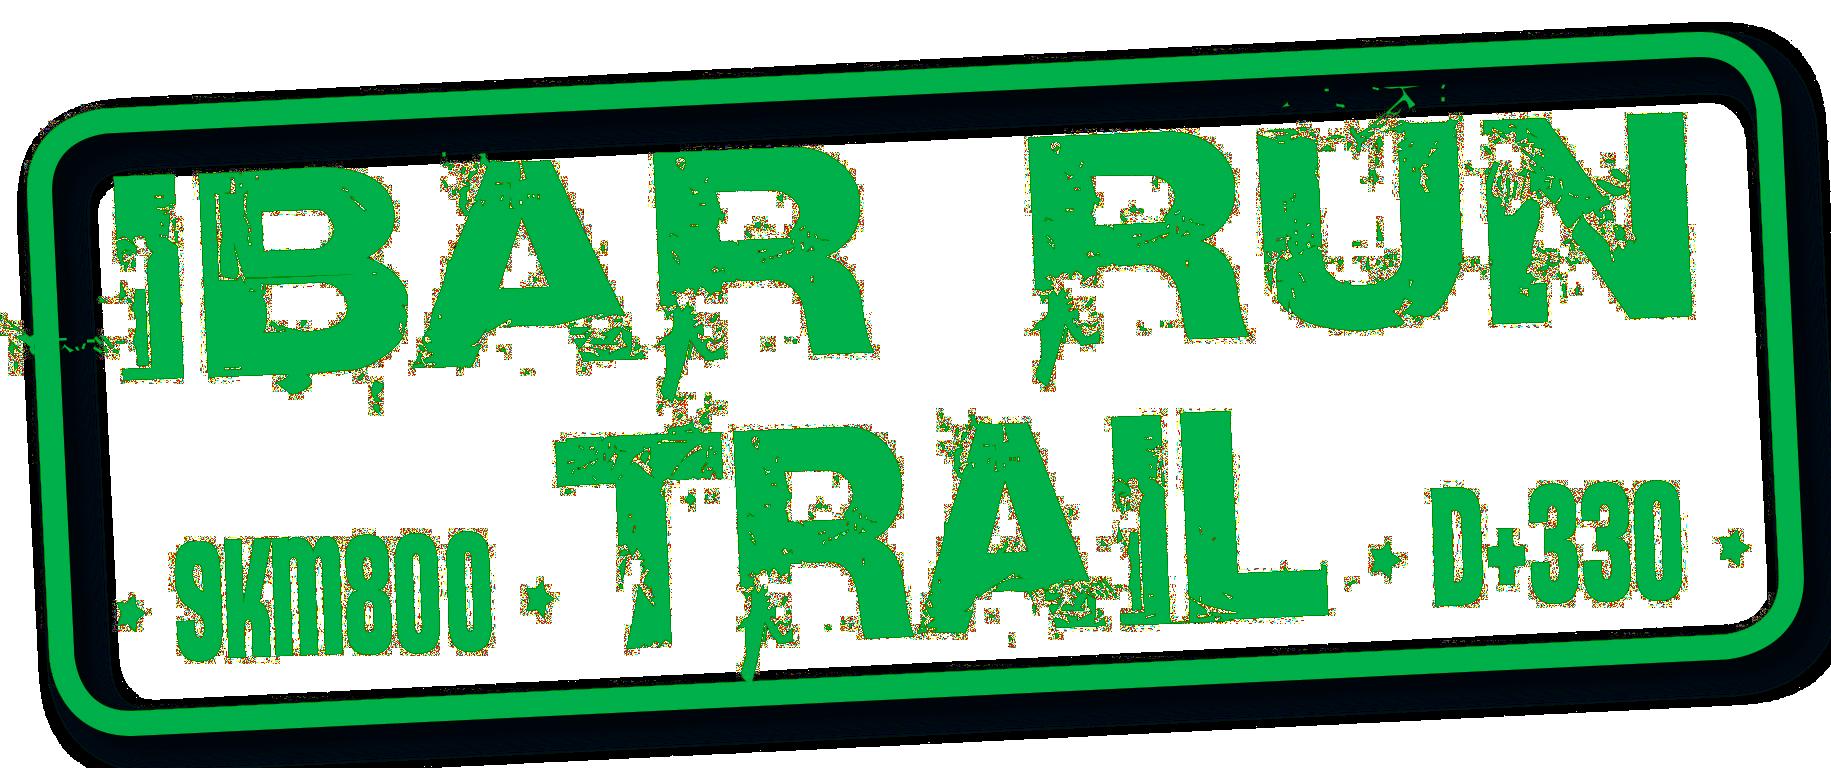 IbarRunTrail